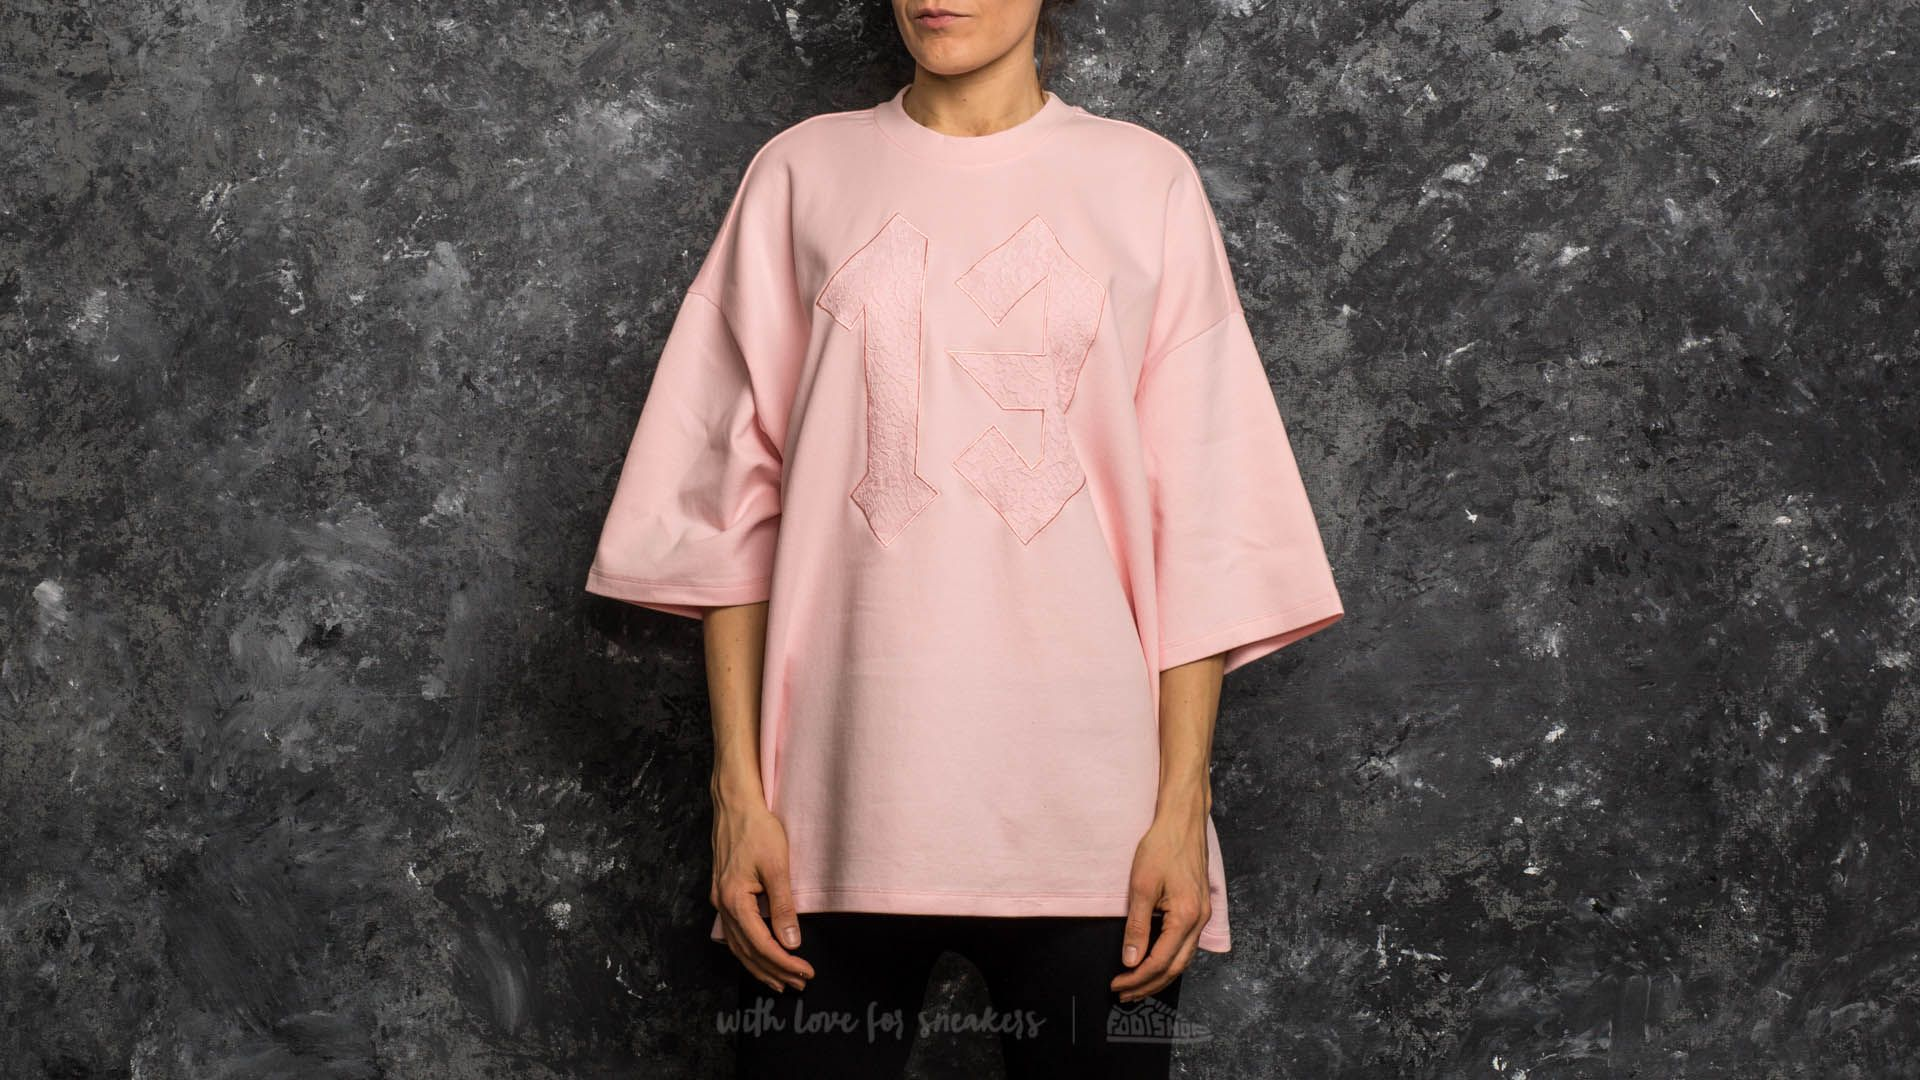 Puma Fenty x Rihanna Oversized Crewneck T-Shirt Crystal Rose ... 0350e340f